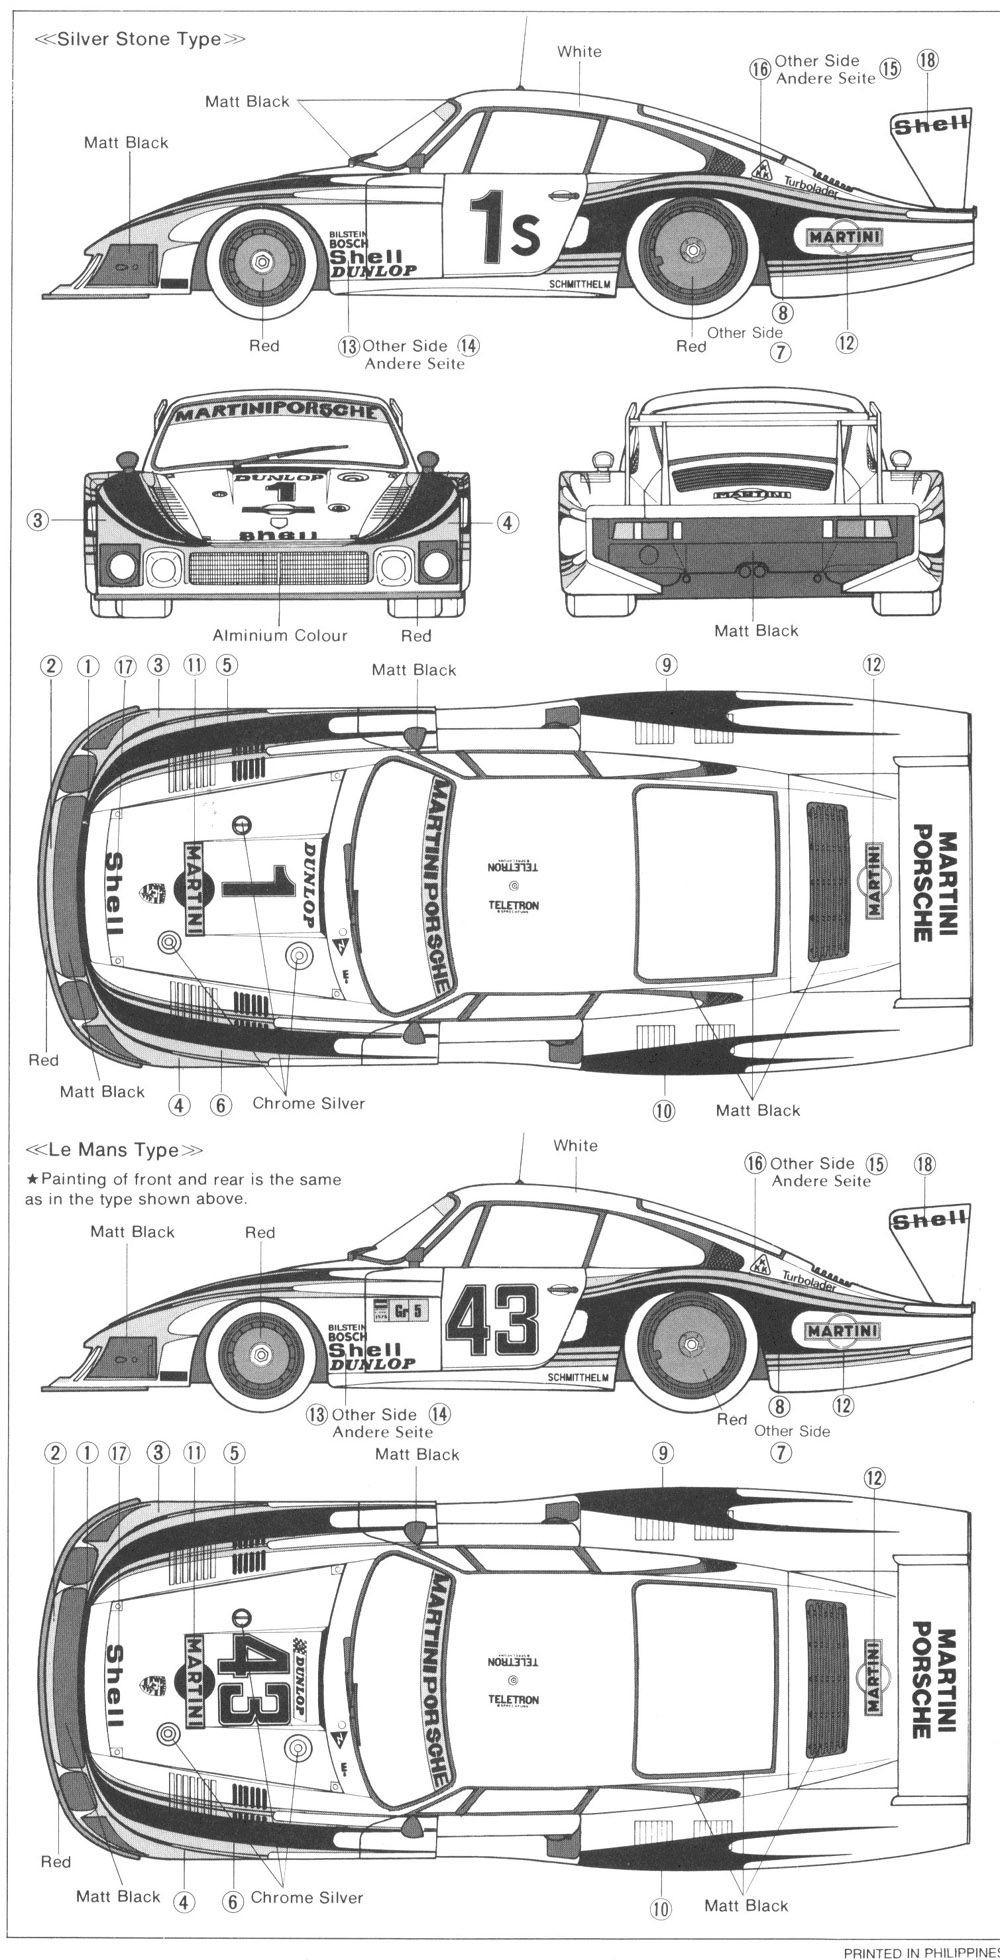 Car Engine Diagram Poster the Mercedes Slr Mclaren Racecars Profiles Pinterest Of Car Engine Diagram Poster